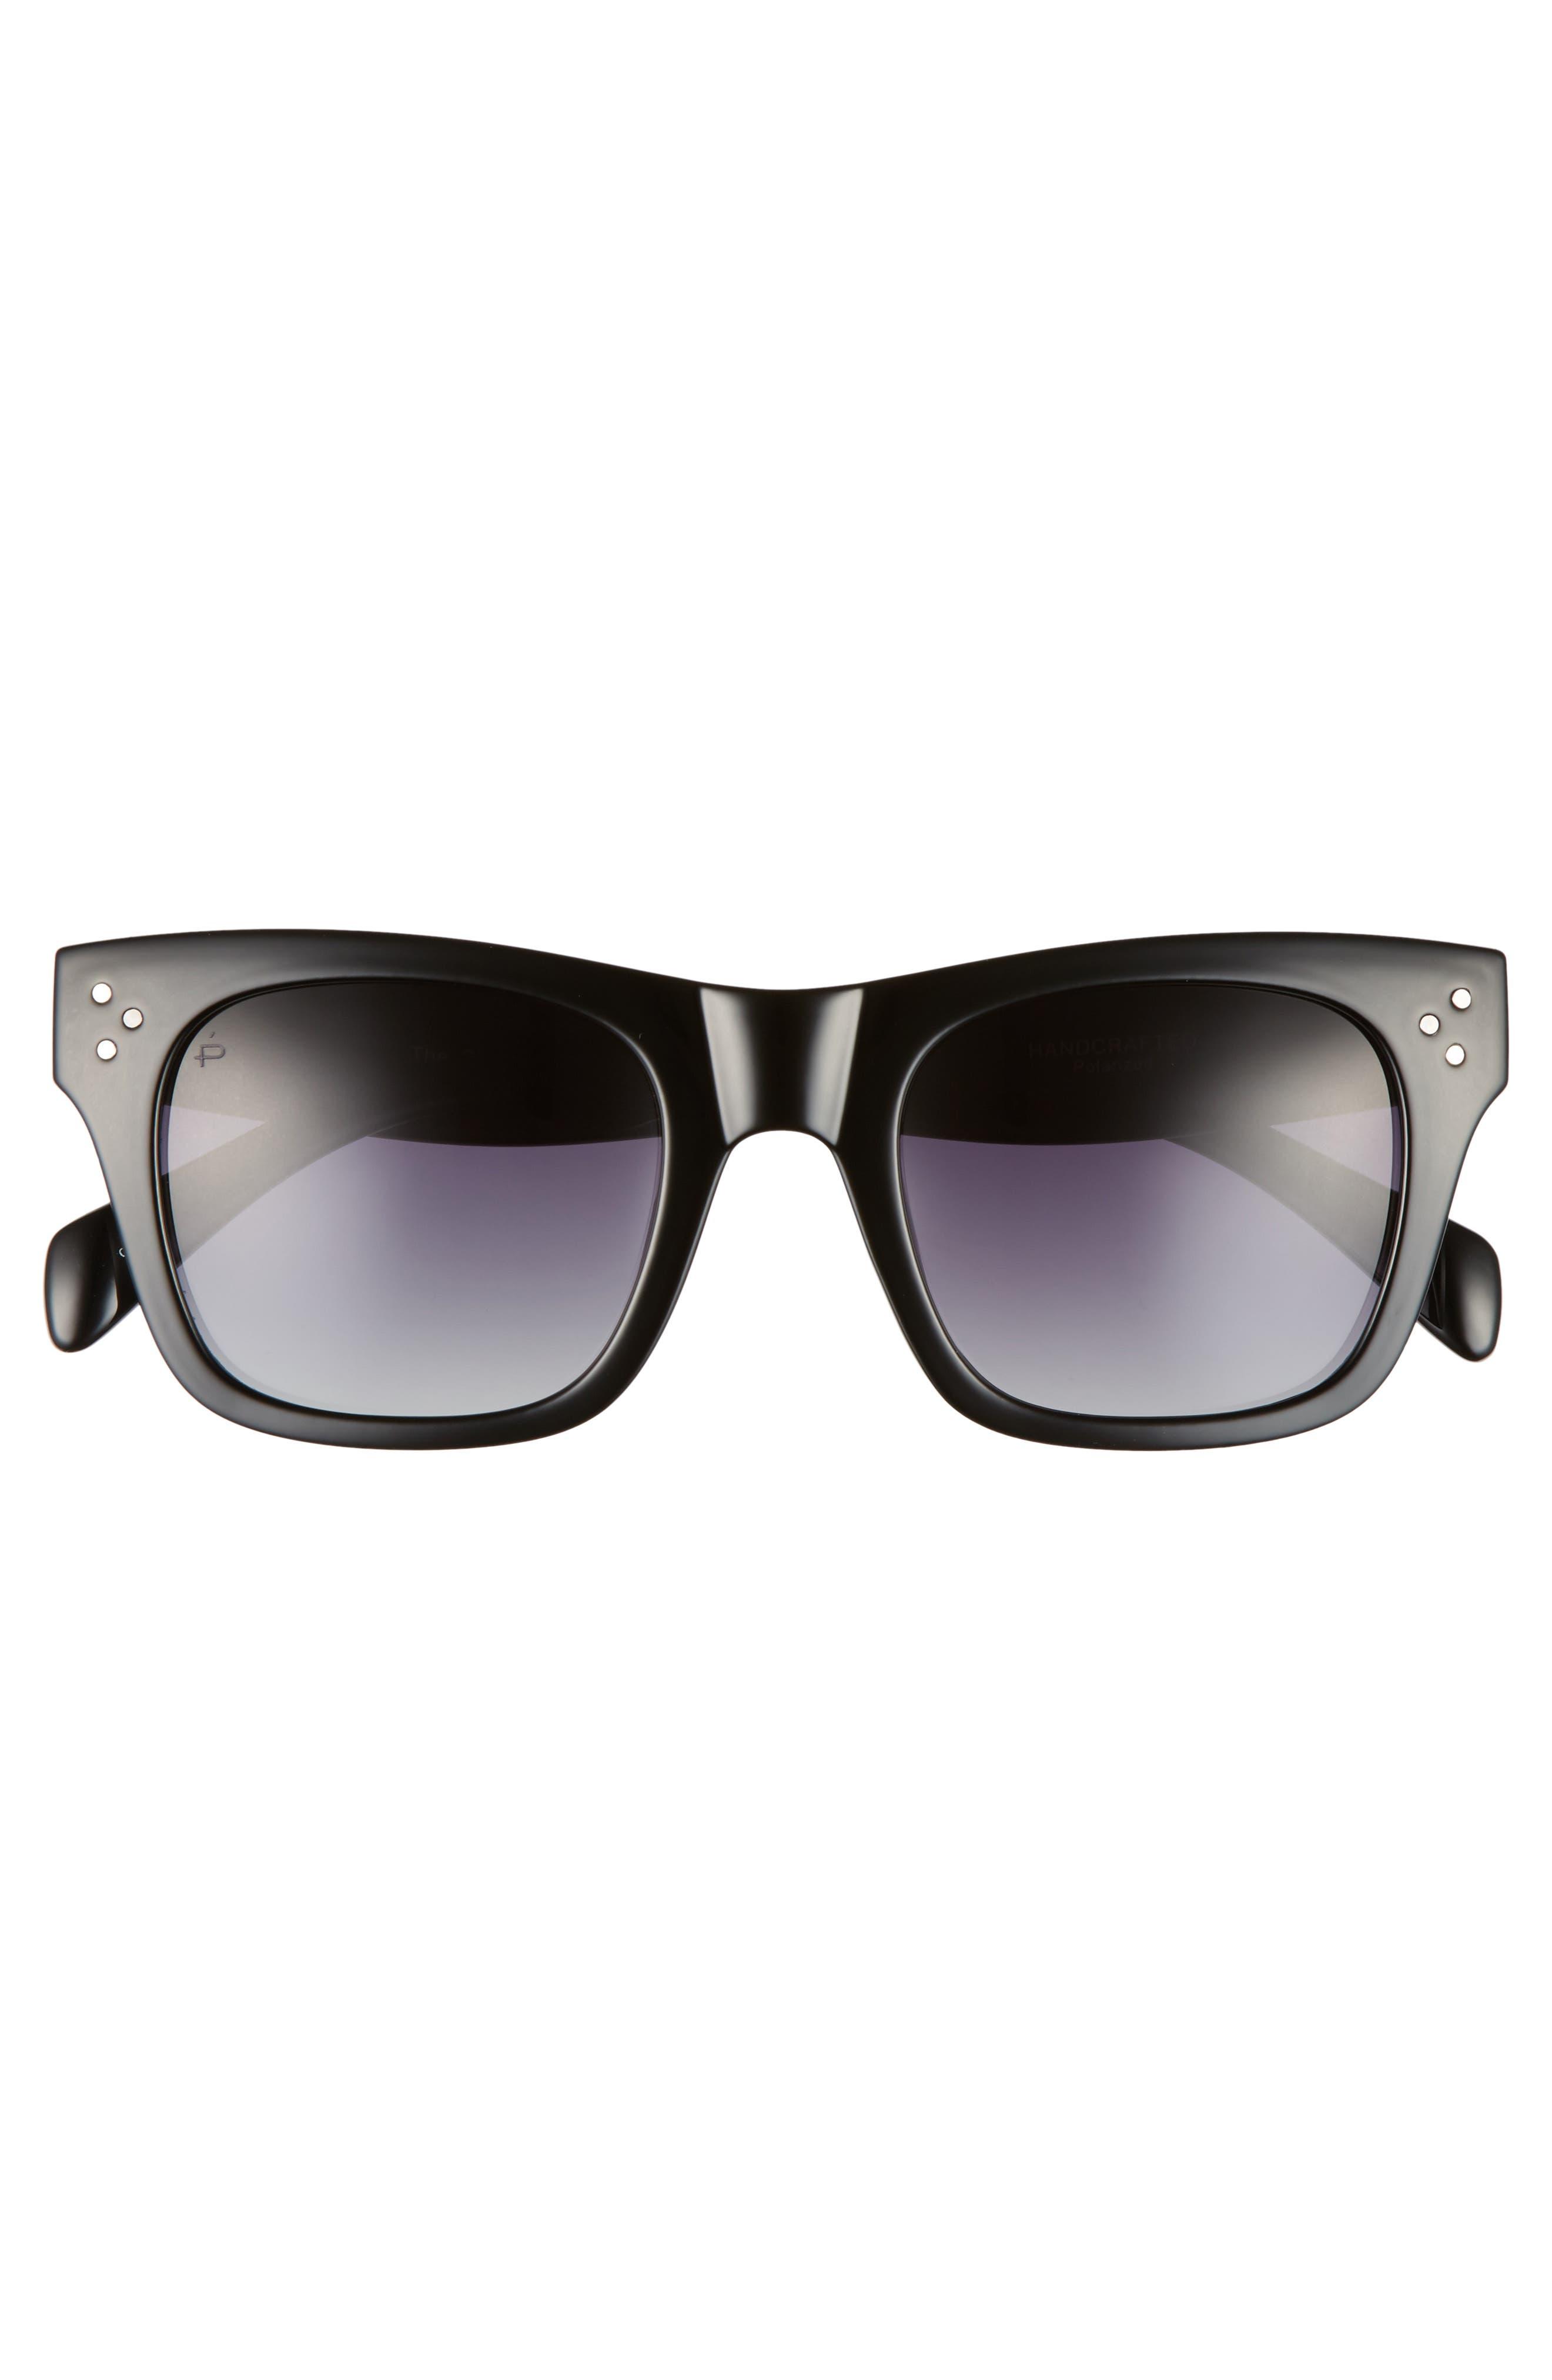 Privé Revaux The Classic 51mm Polarized Square Sunglasses,                             Alternate thumbnail 5, color,                             Black